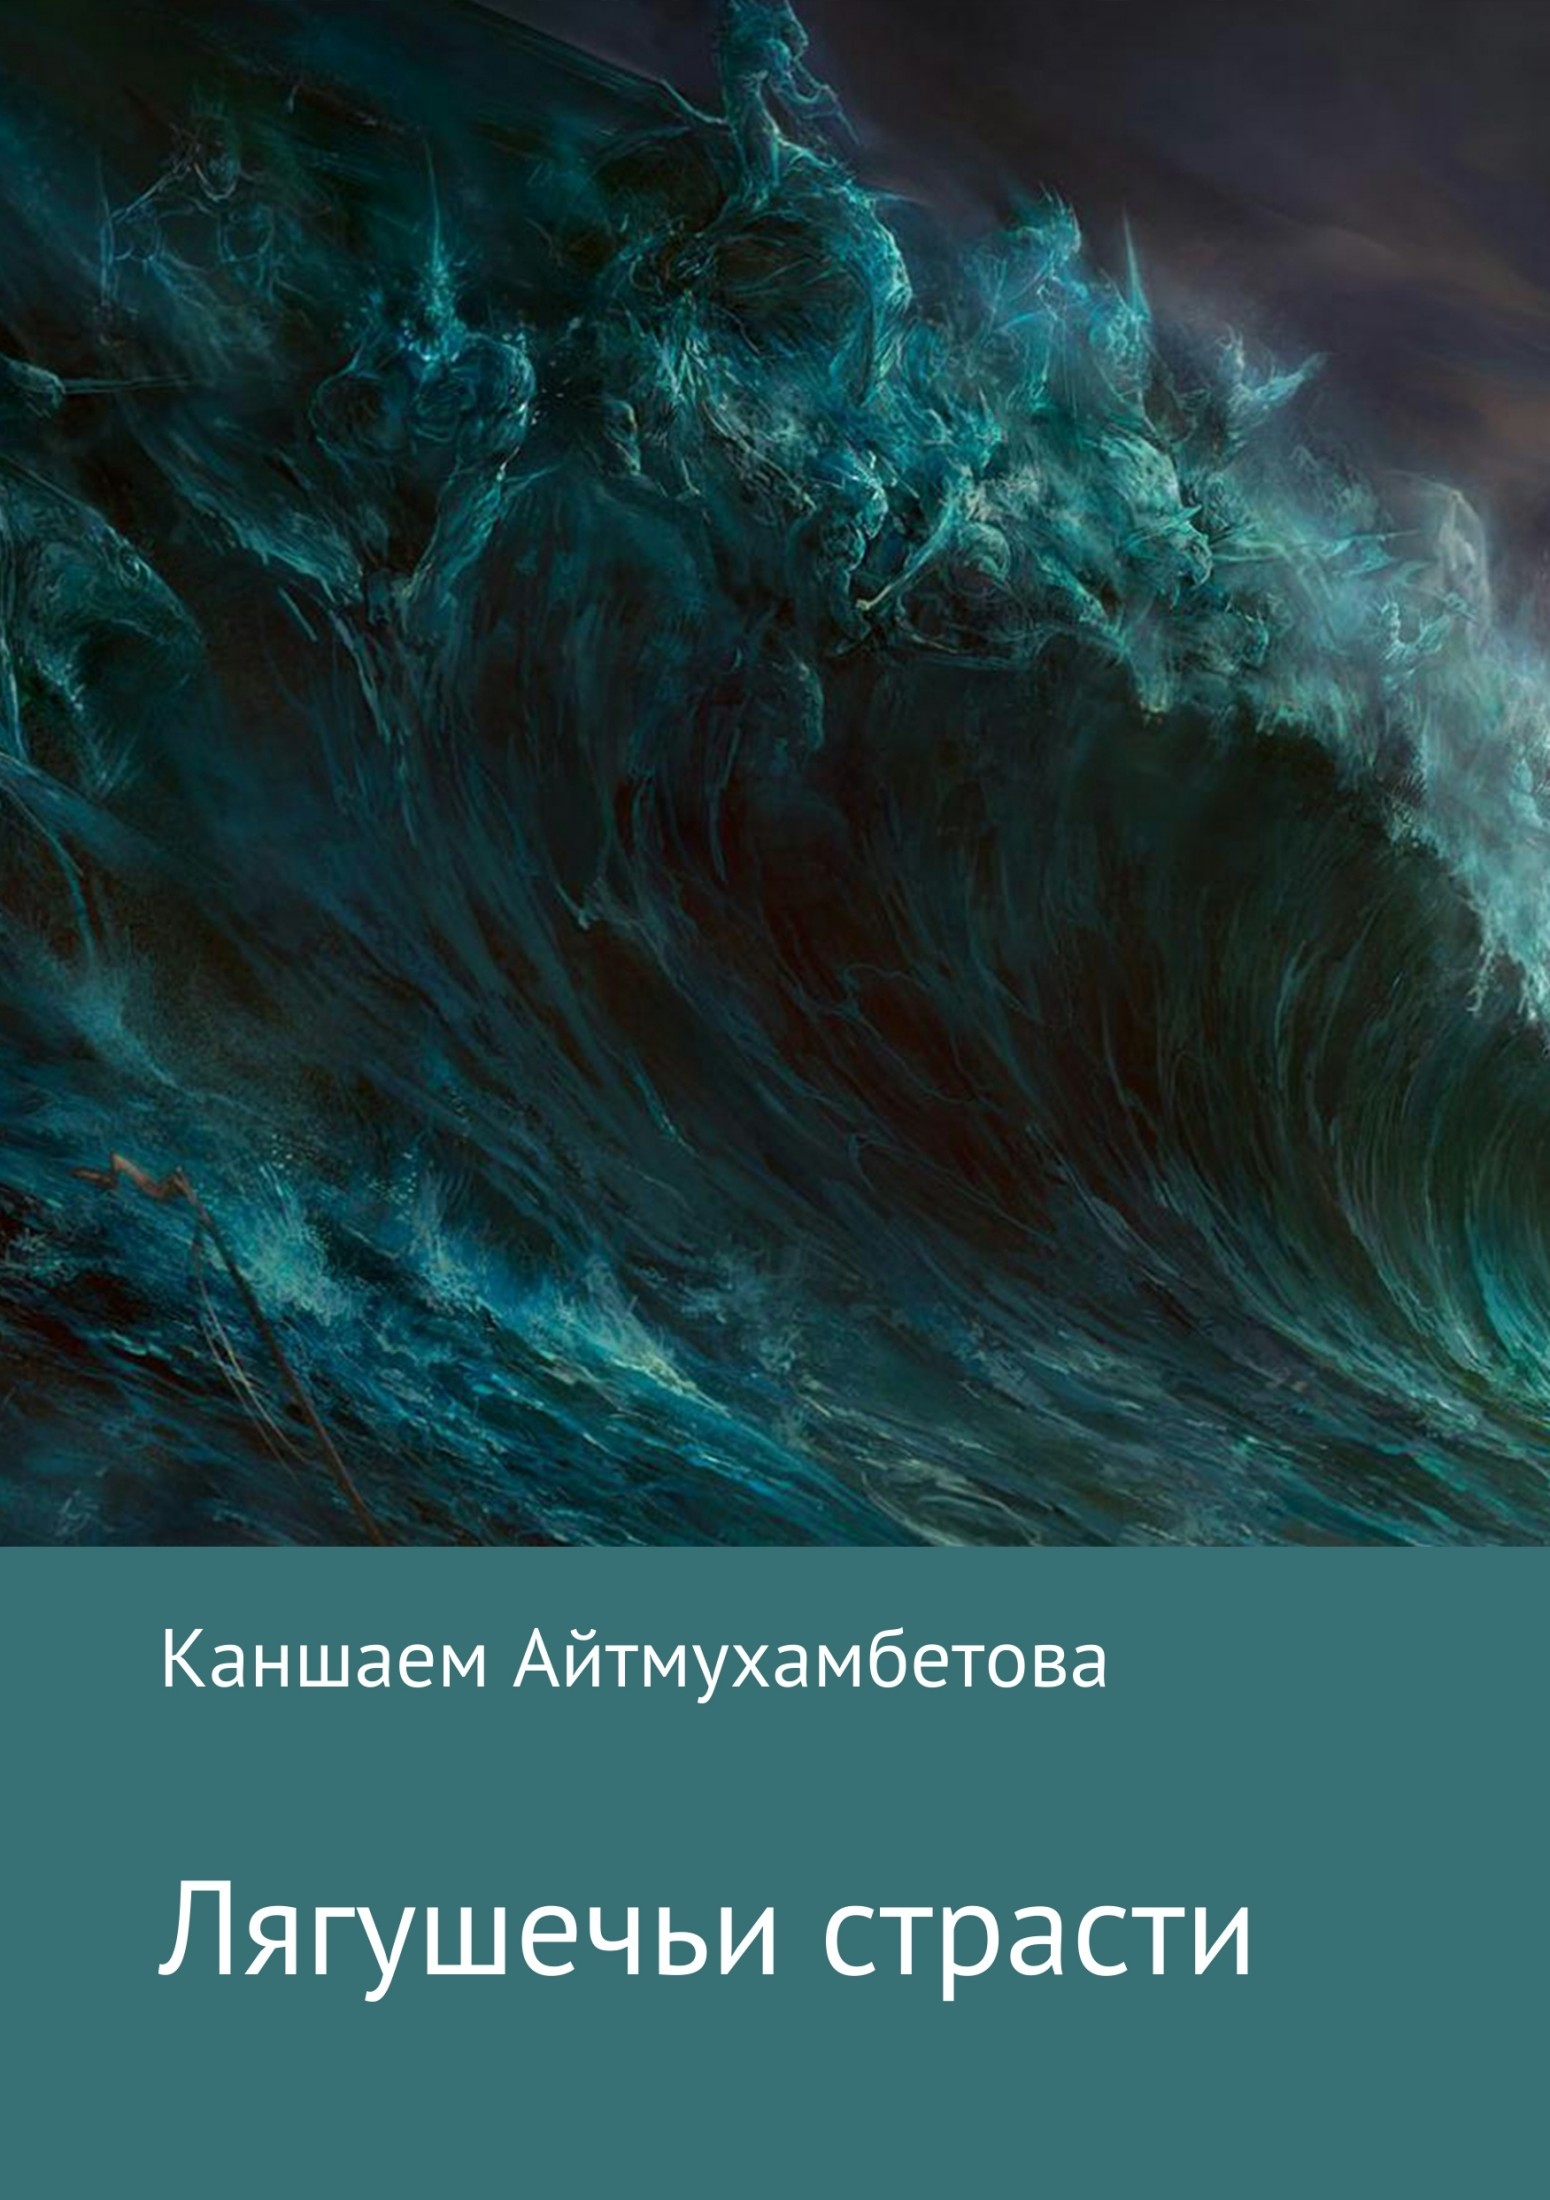 Каншаем Карисовна Айтмухамбетова Лягушечьи страсти каншаем карисовна айтмухамбетова каникулы